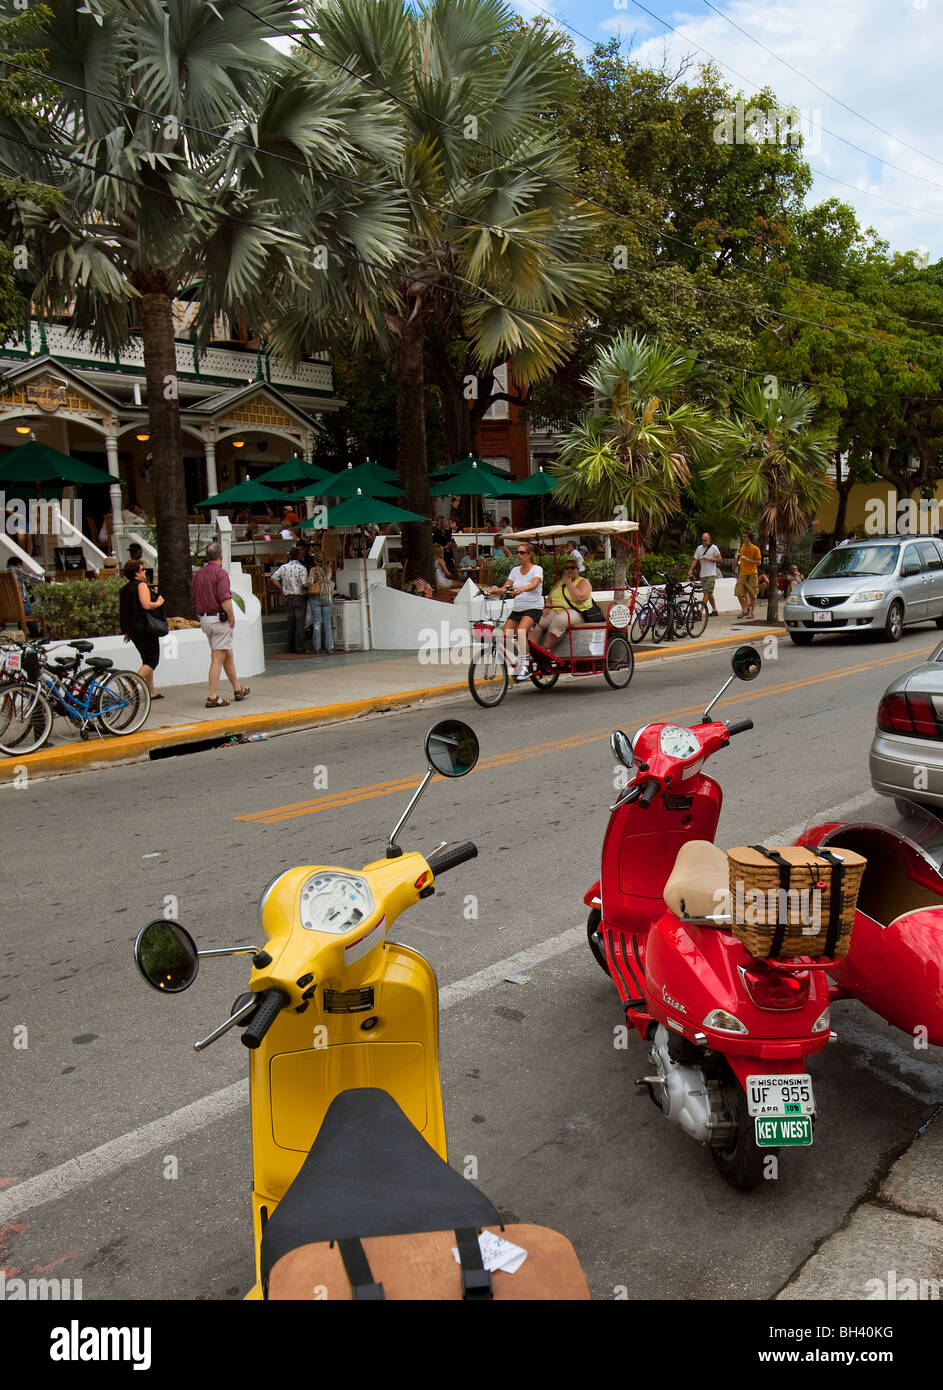 Duval Street, Key West, Florida - Stock Image